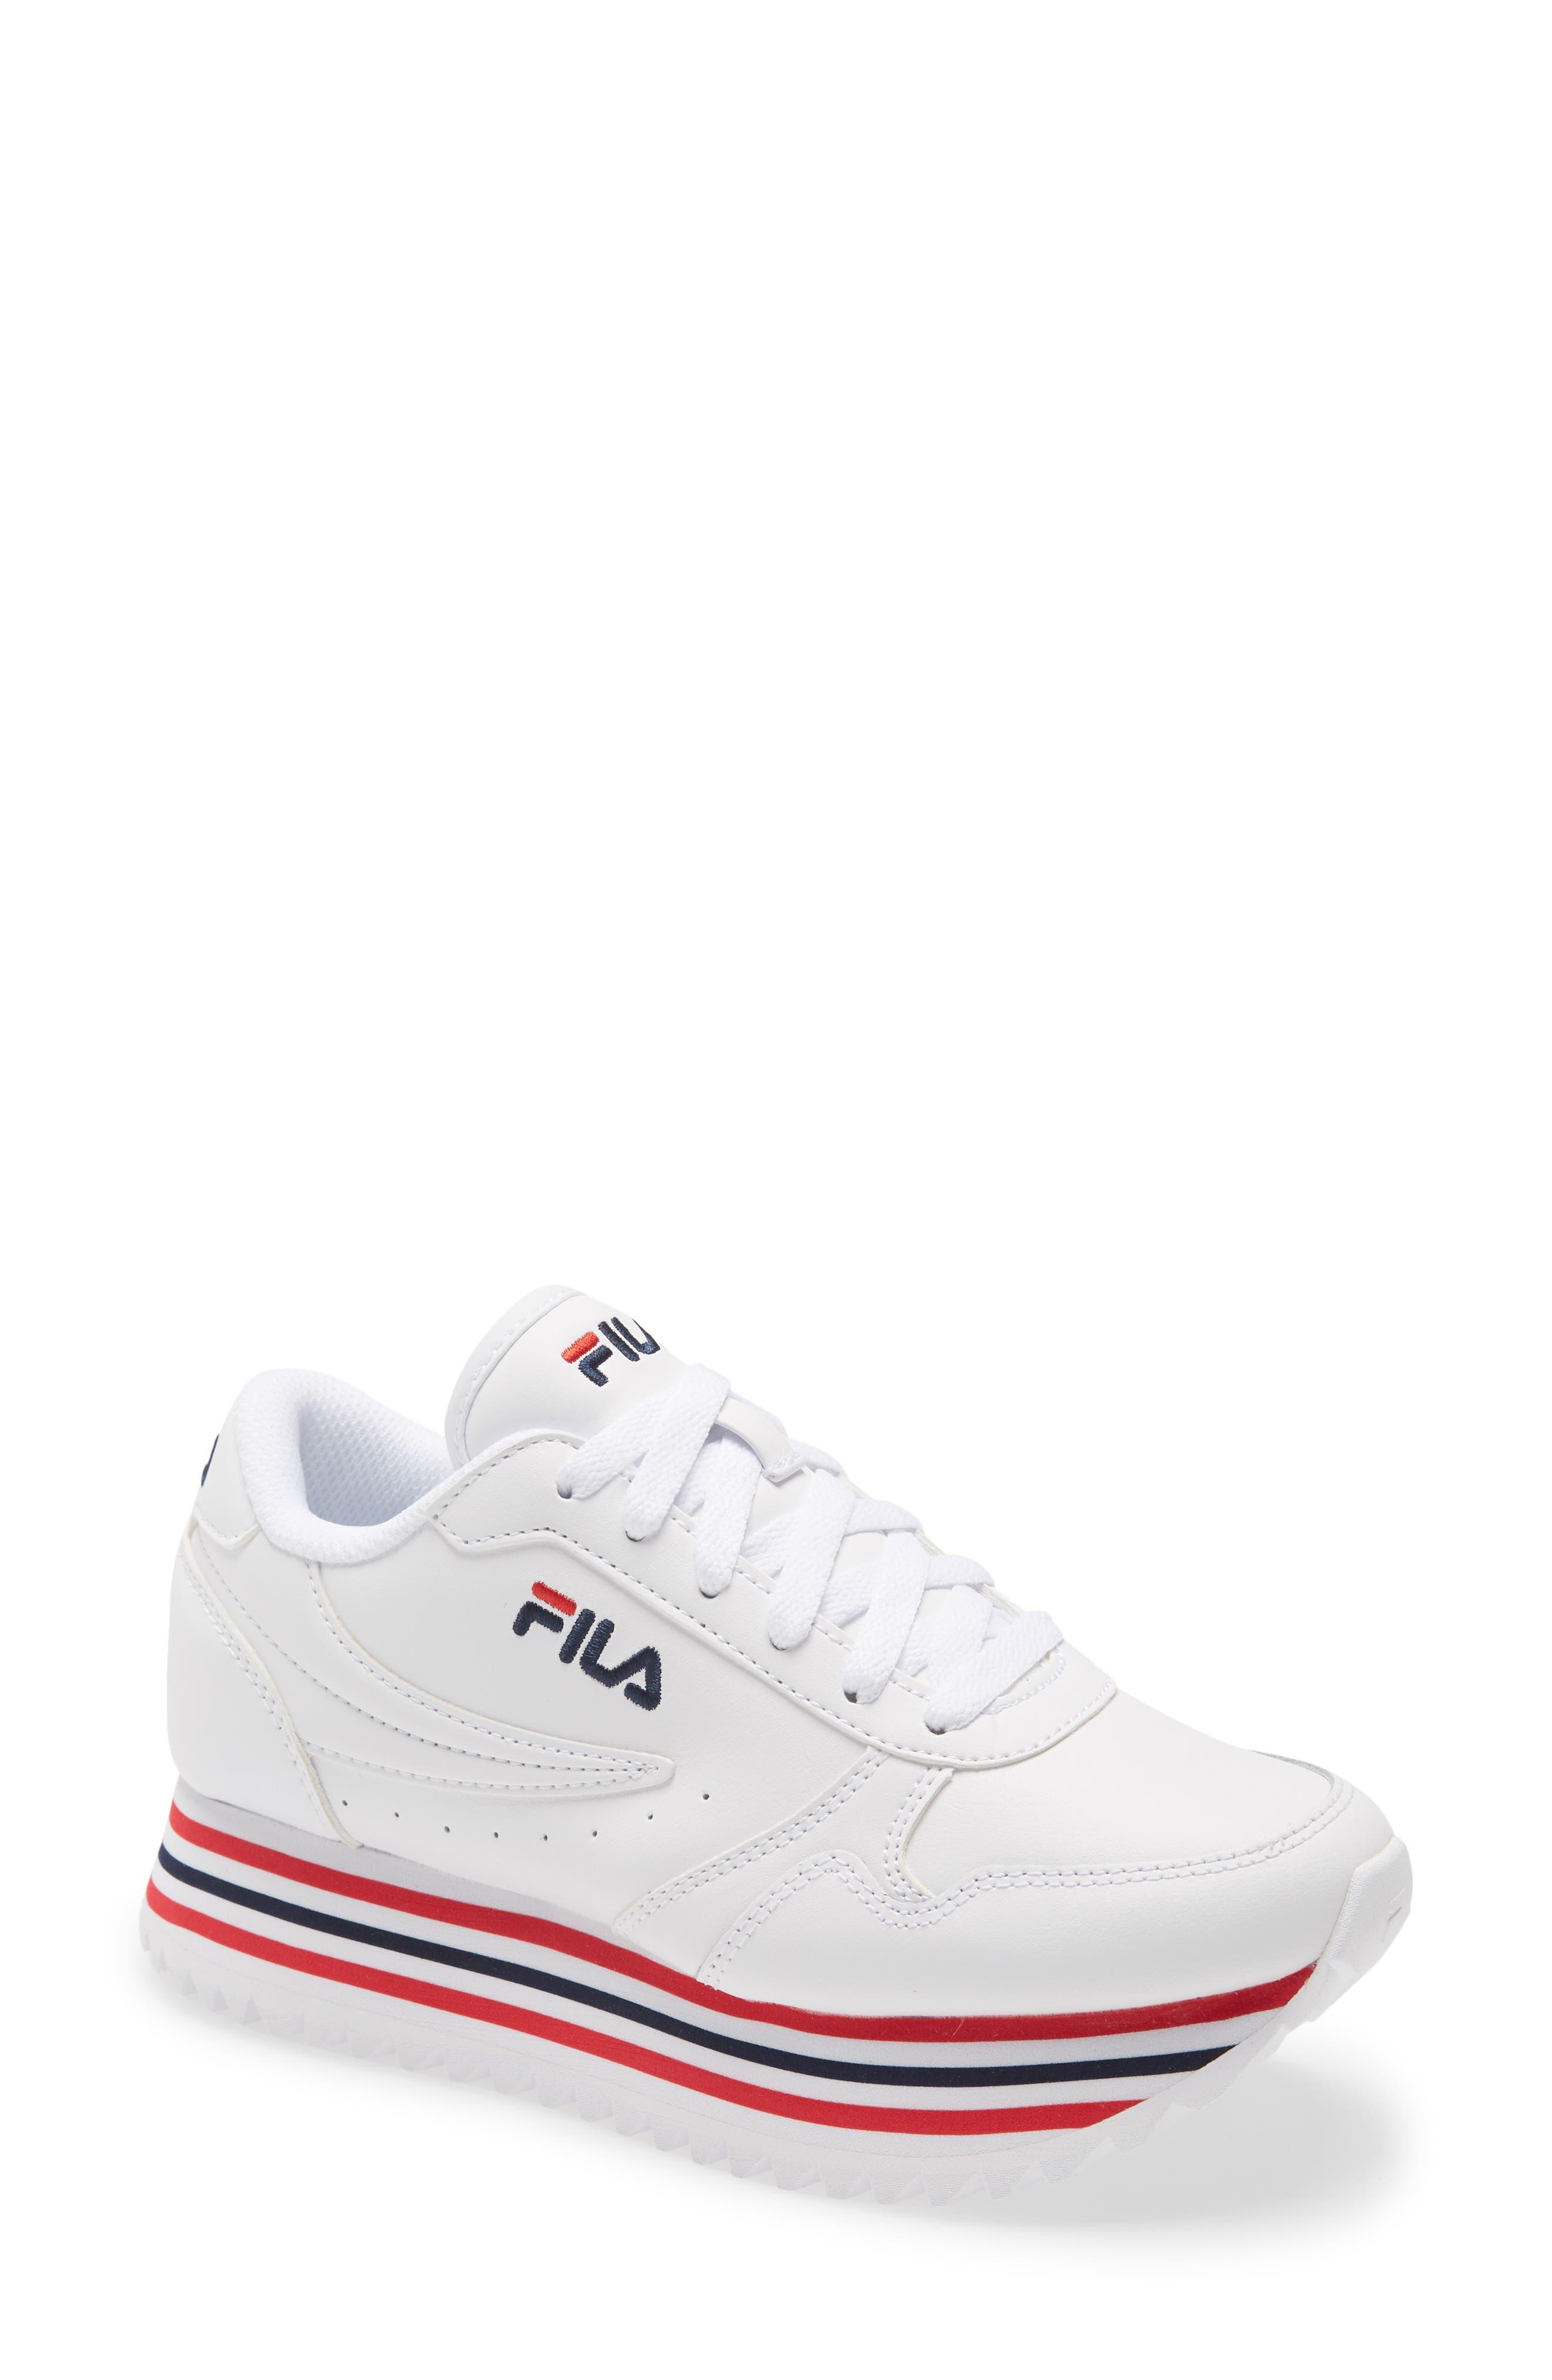 Women's FILA Shoes | Nordstrom